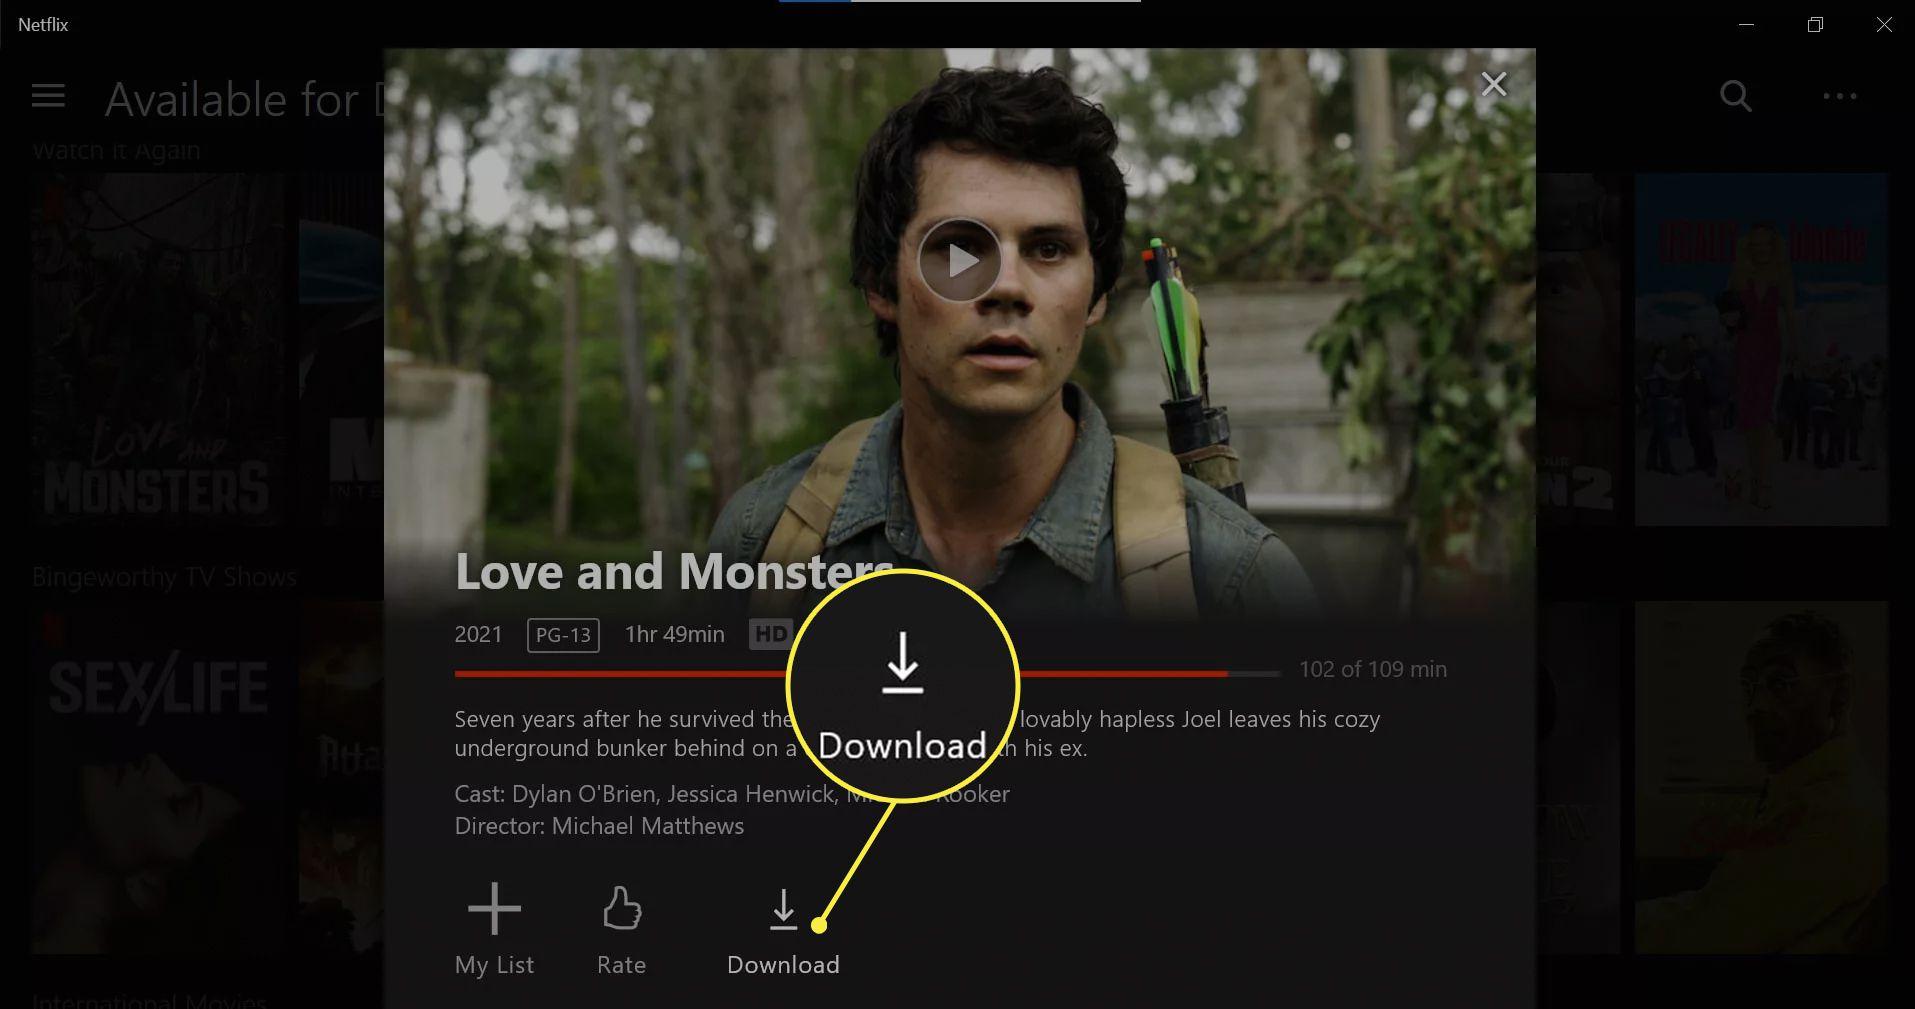 Download option highlighted on Netflix Windows app.